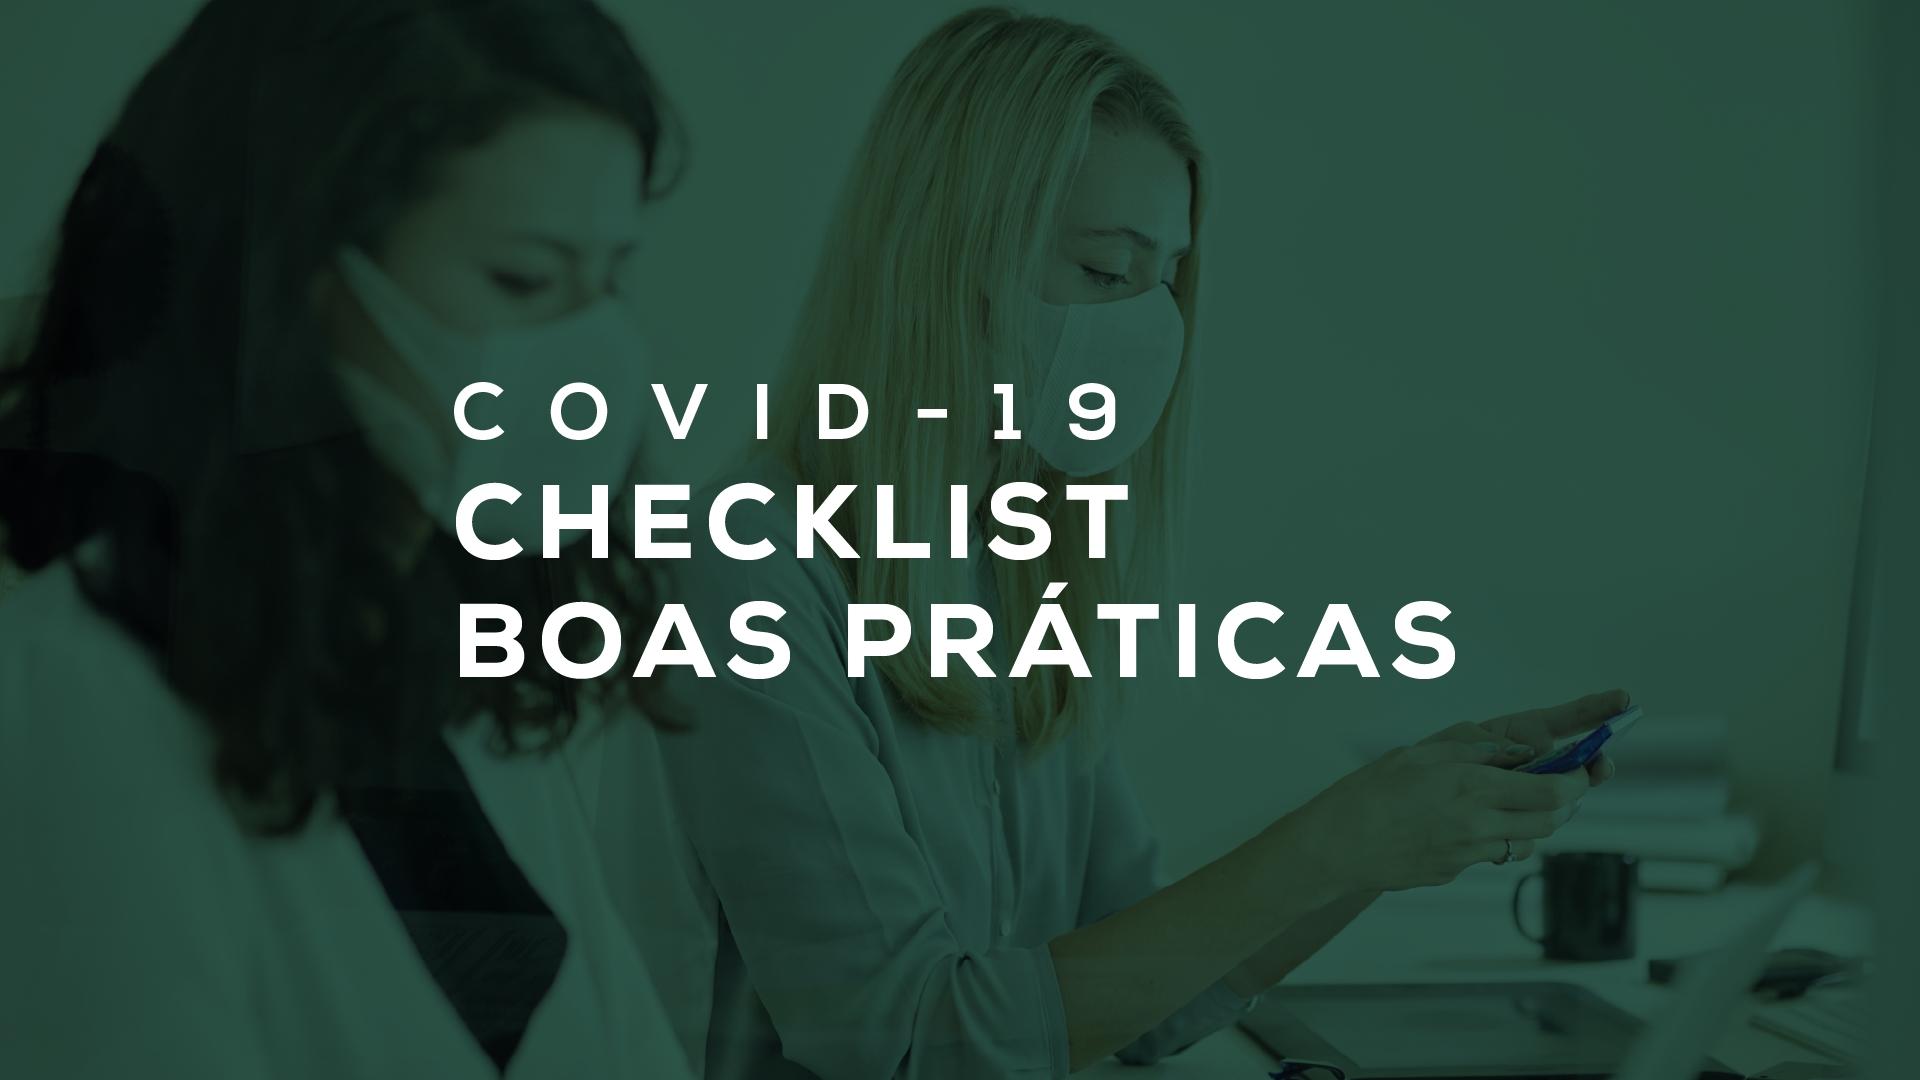 acervo_covid 07. Checklist boas praticas covid